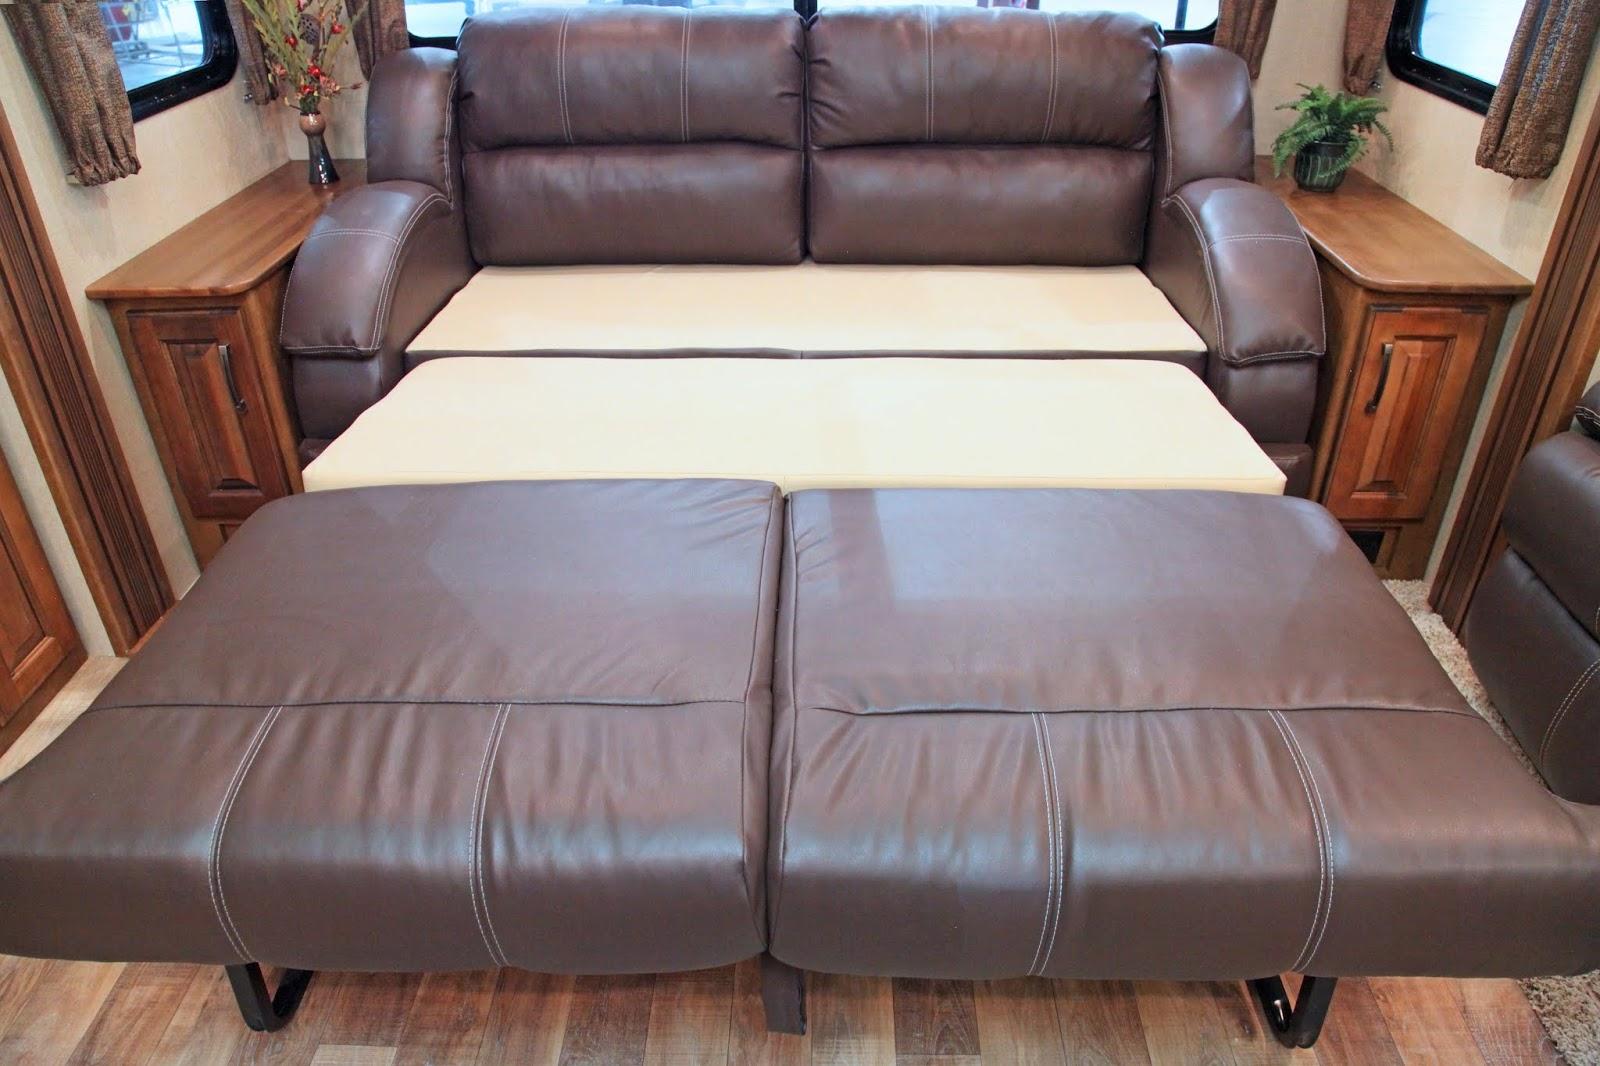 Rv Tri Fold Sofa Home Decor Image